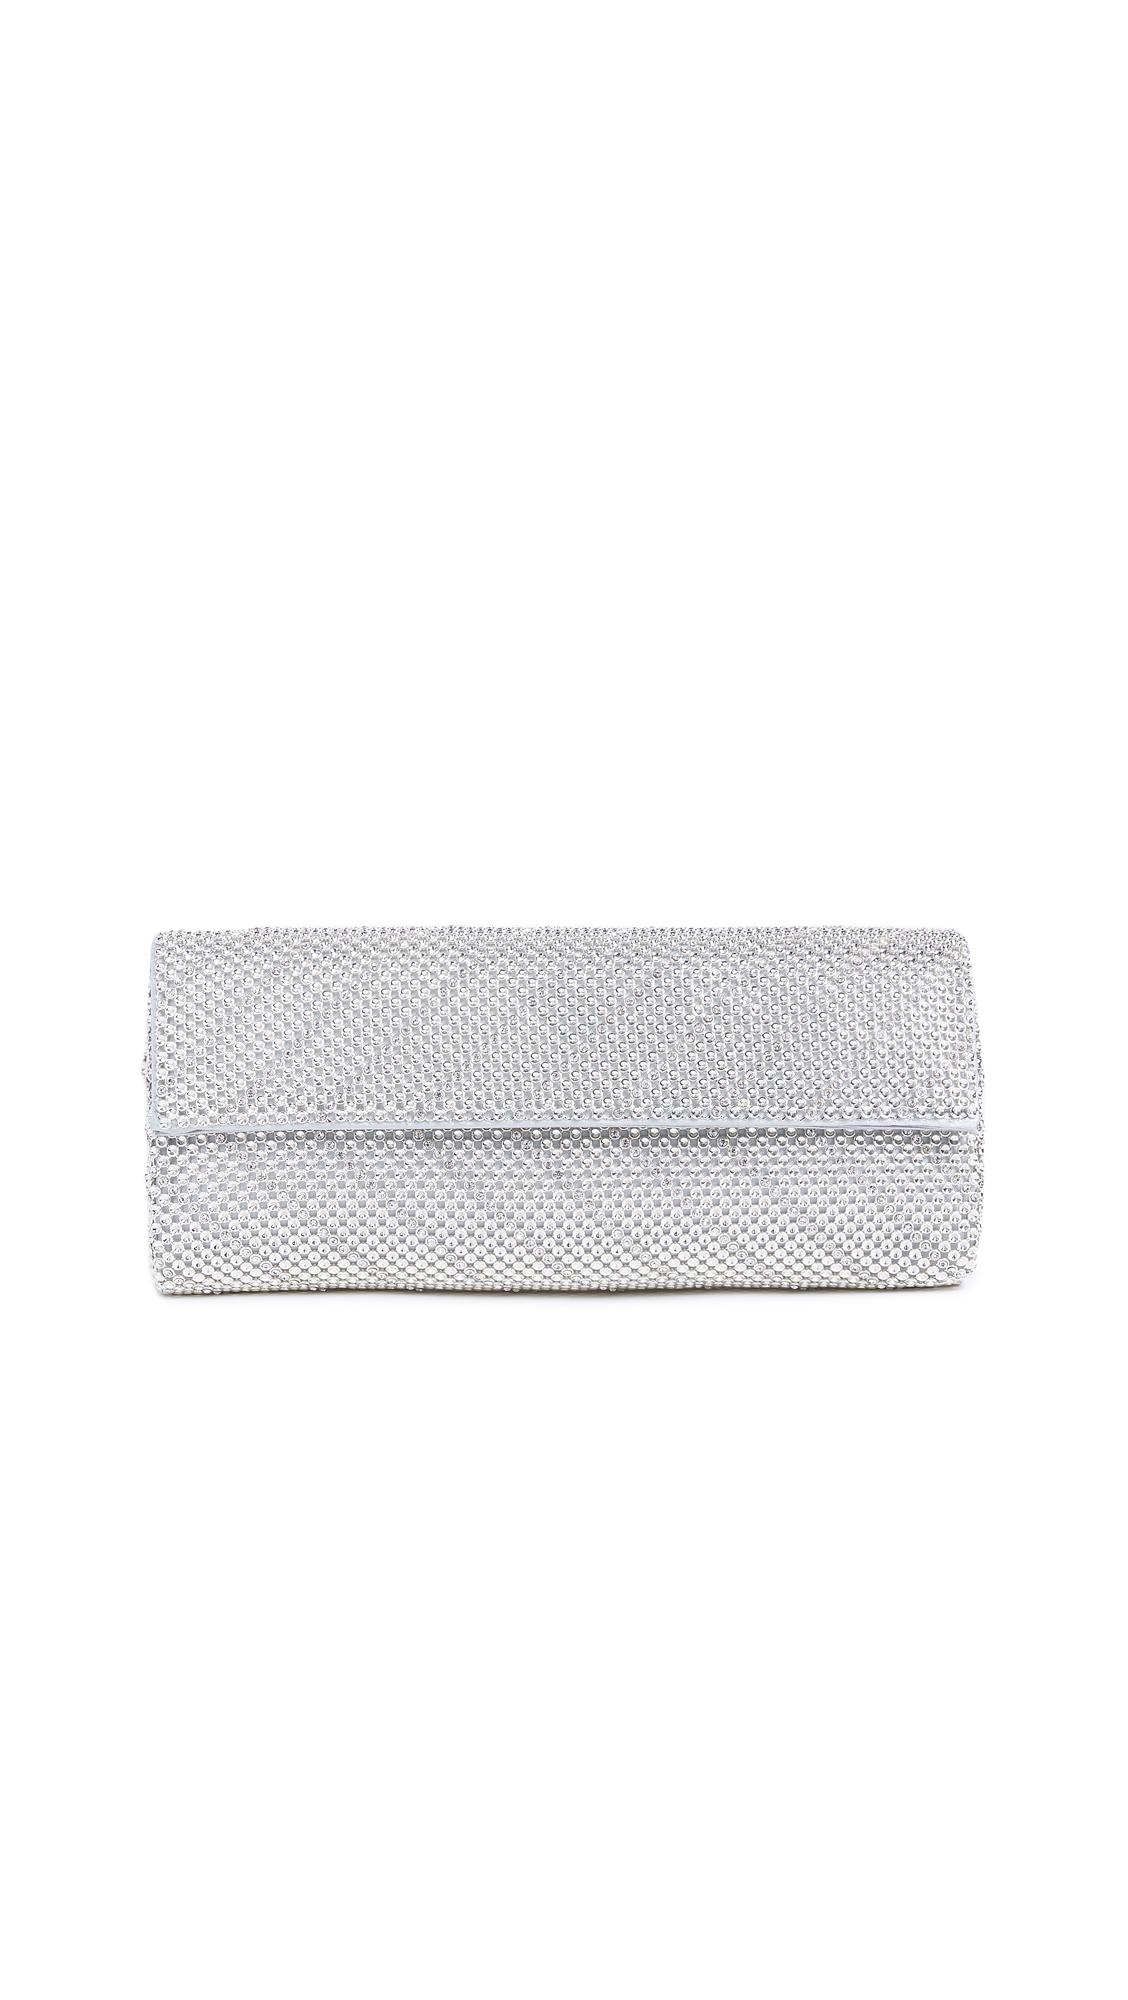 Whiting & Davis Crystal Chevron Clutch - Silver